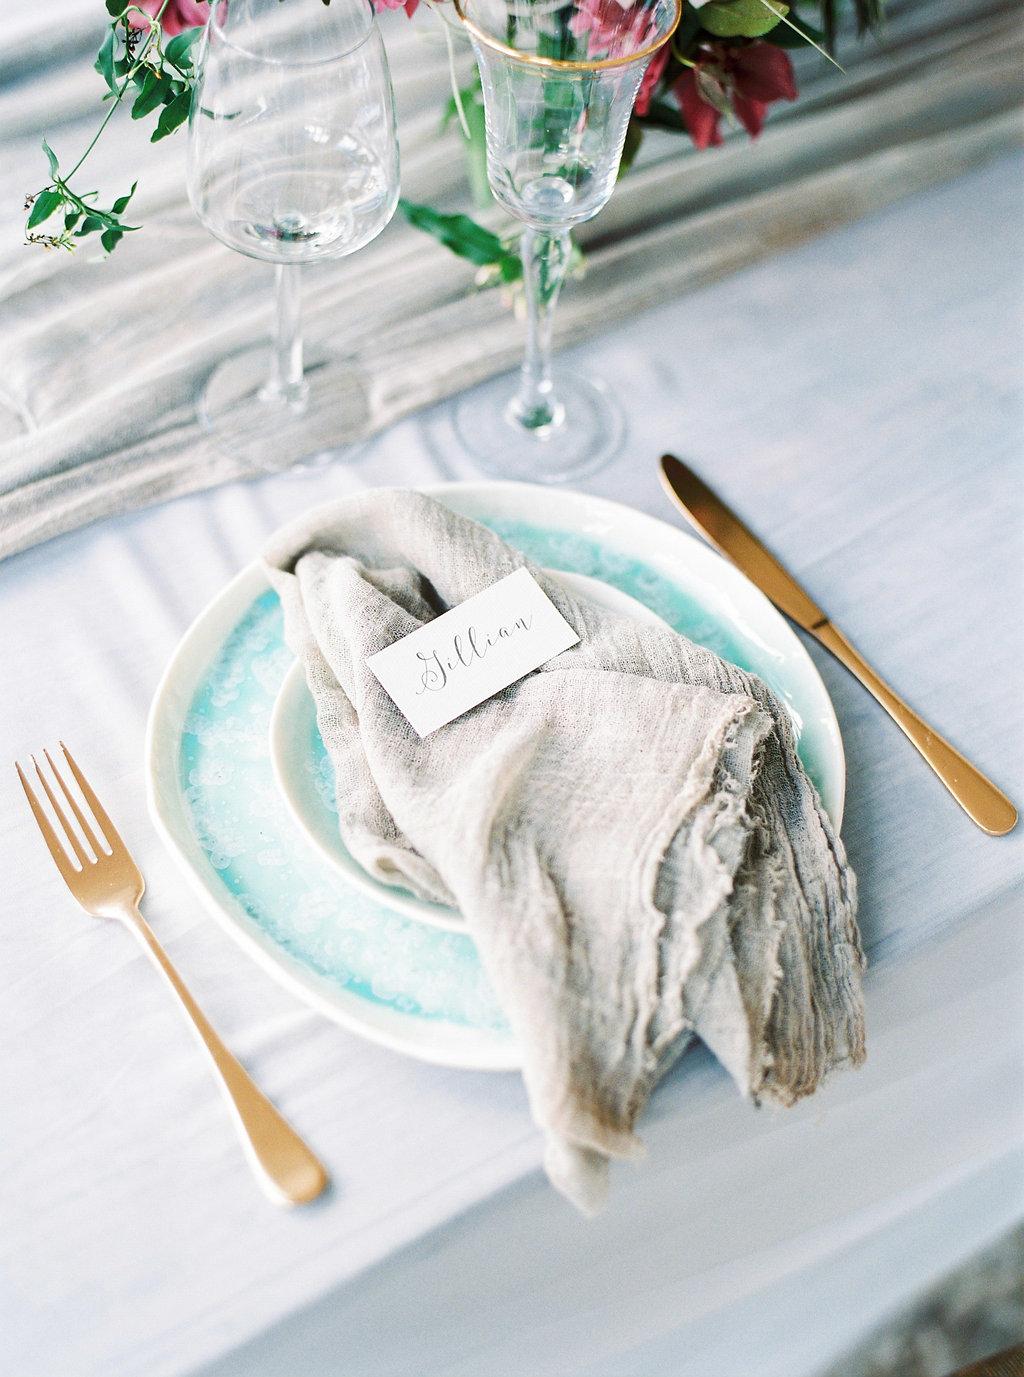 WeddingSparrow-PhotographybyIntoTheLight-Macias-lordan.com-ONLINESHARING(3of50).jpg